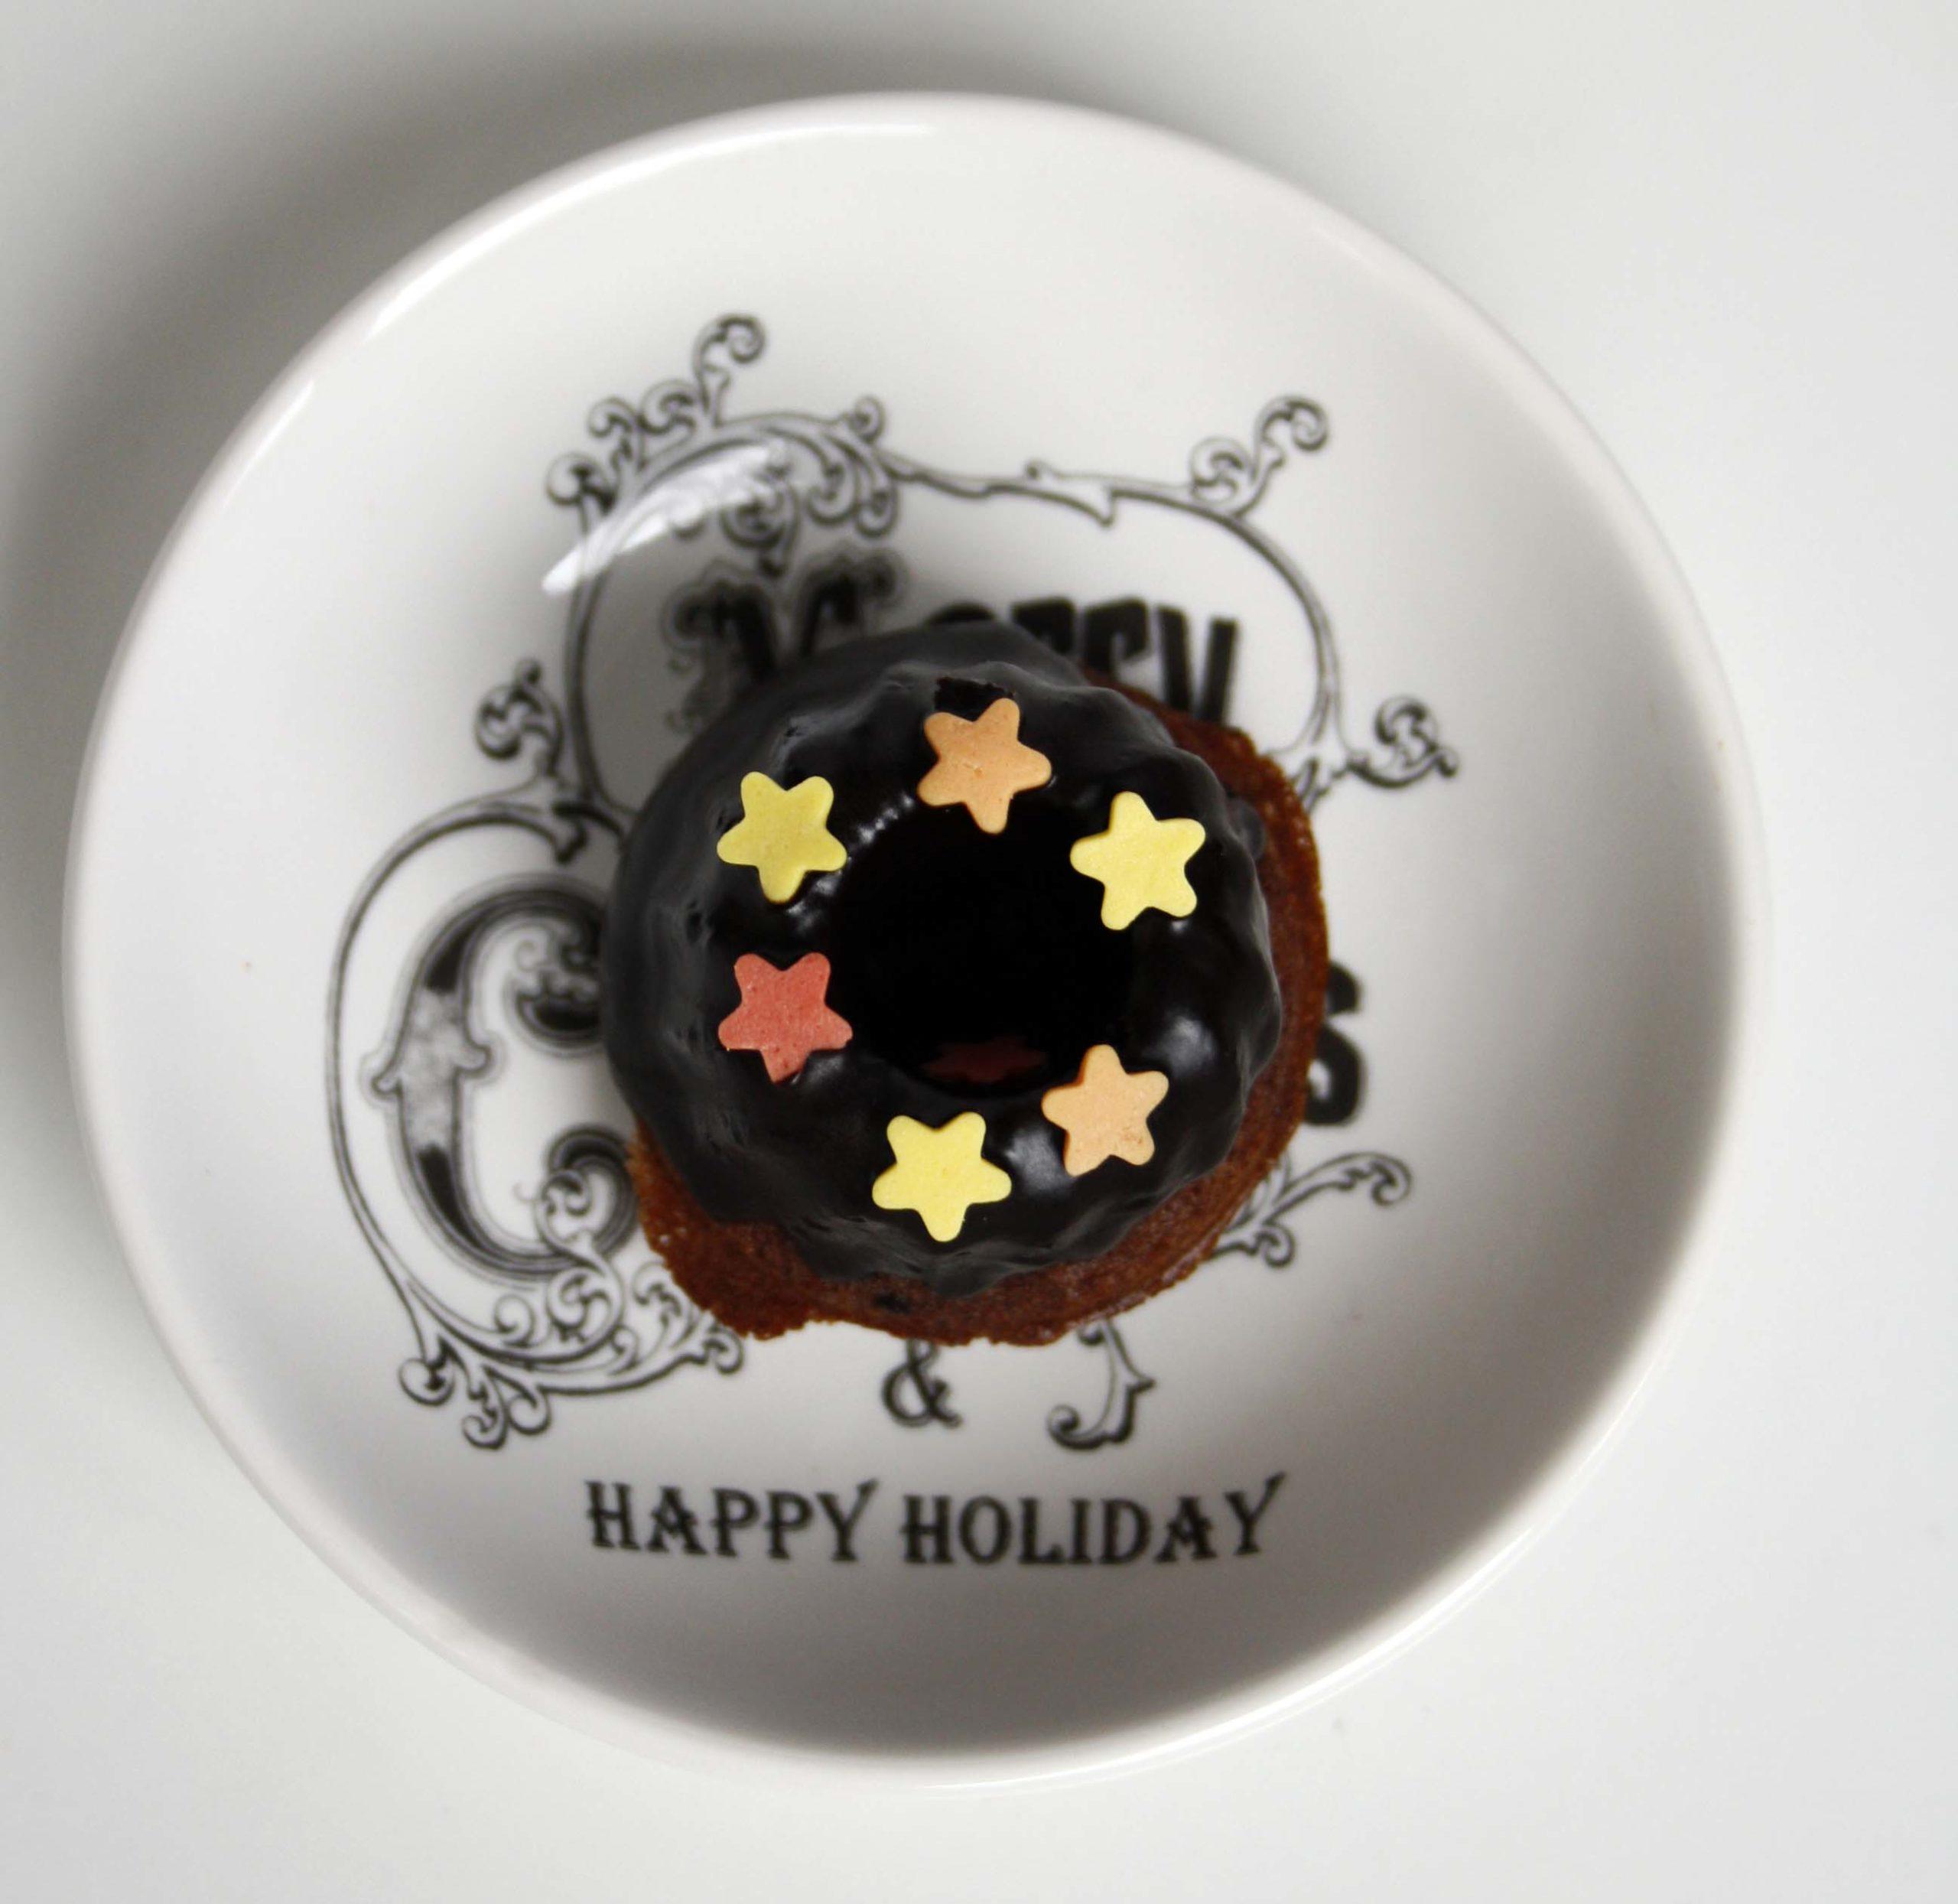 Schokoladen-Kaffee-Gugel // Mini chocolate coffee bundtcakes by http://babyrockmyday.com/schokoladen-kaffee-gugel/